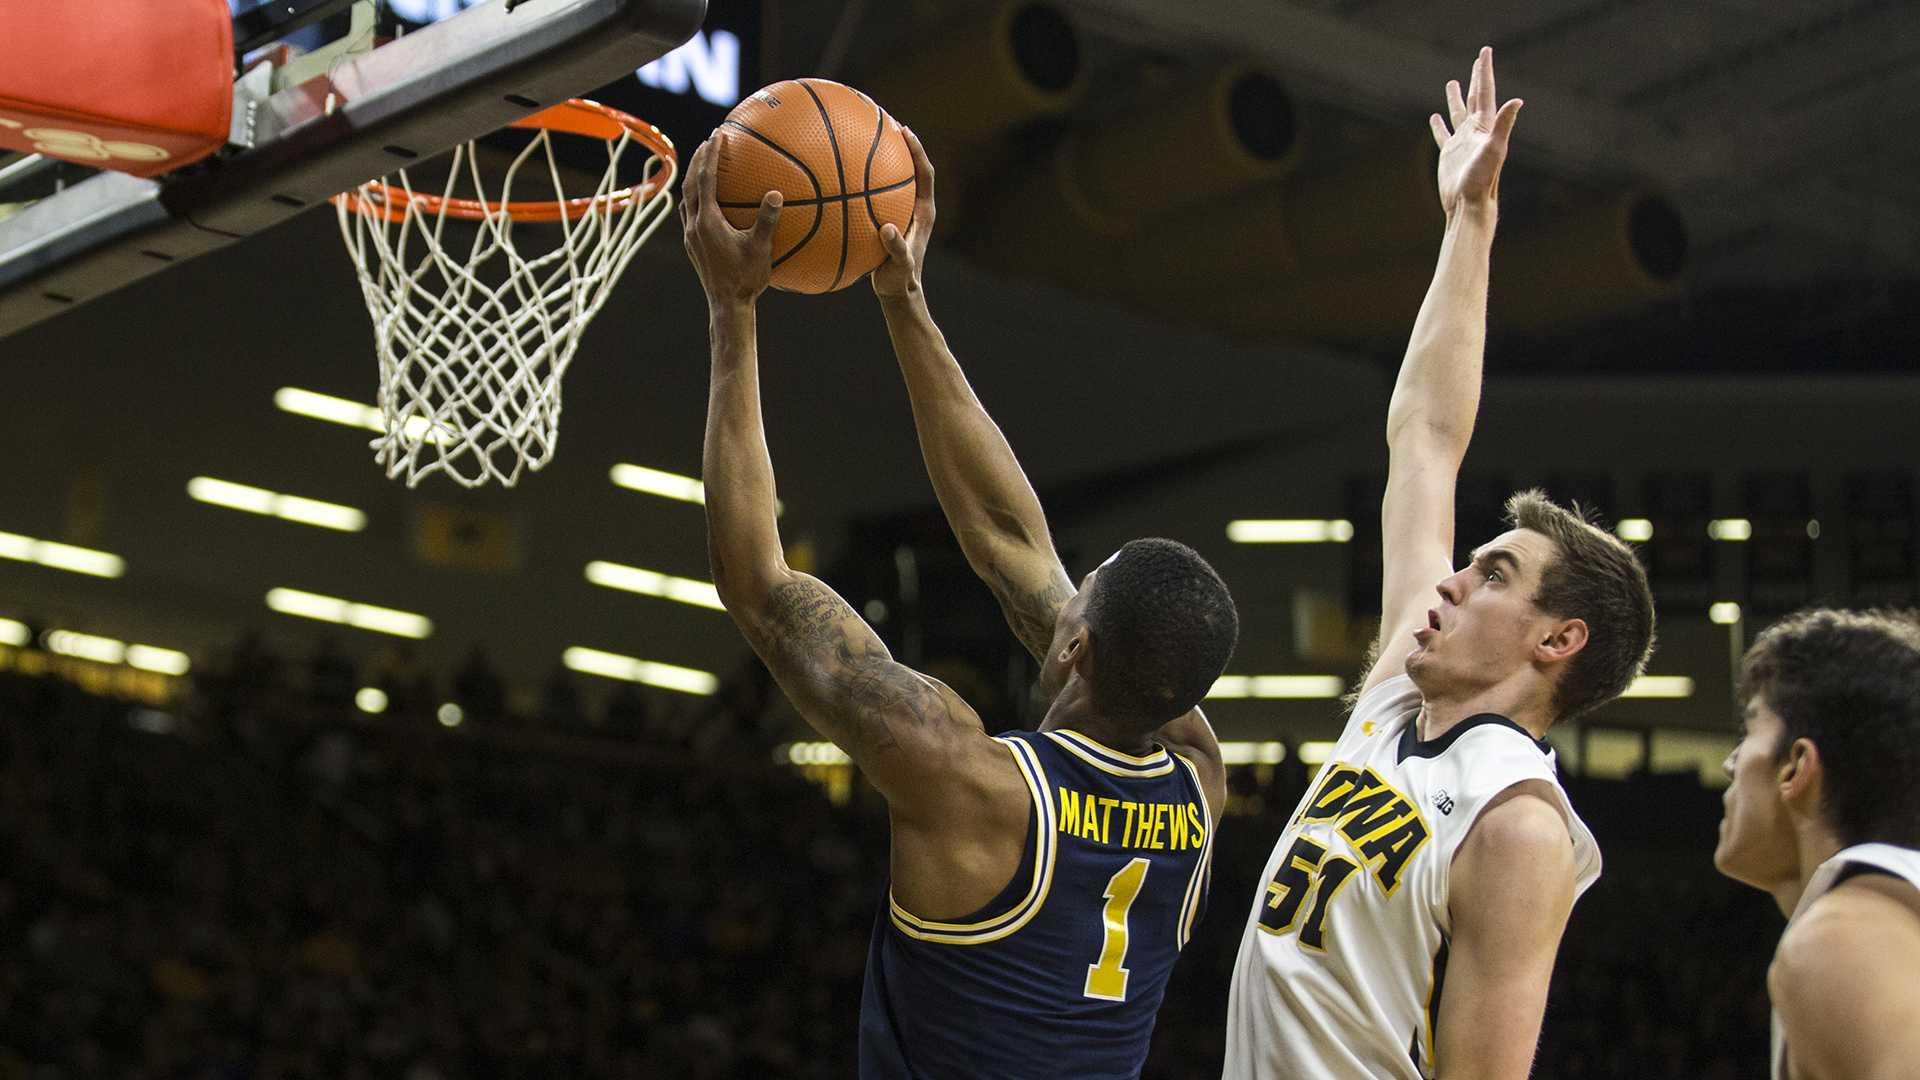 Photos: Iowa Men's Basketball vs. Michigan (01/02/17)